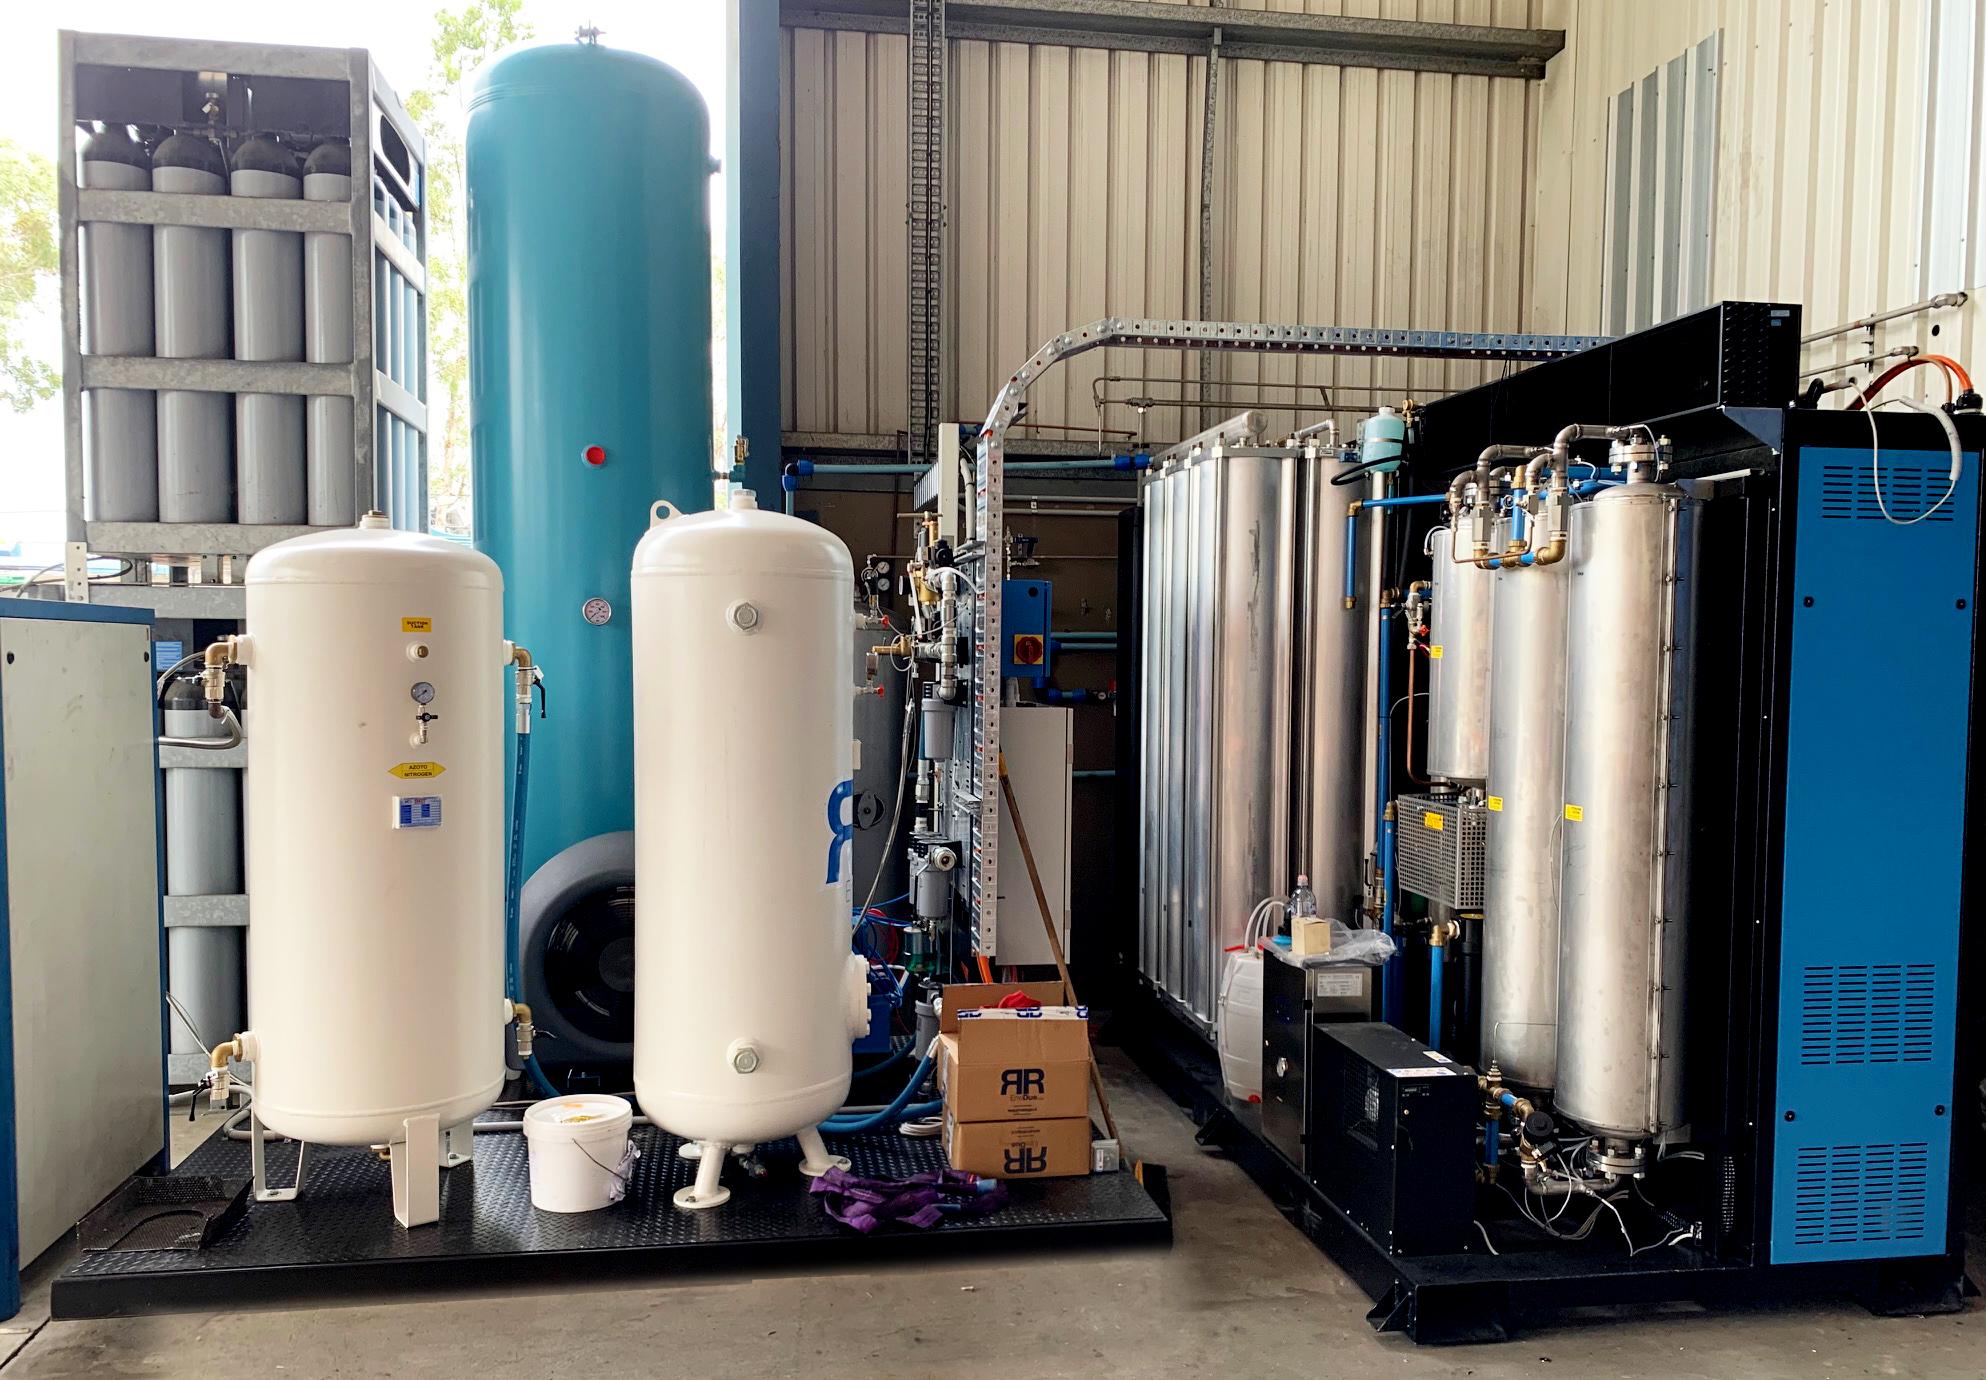 Brisbane H2 Generation plant